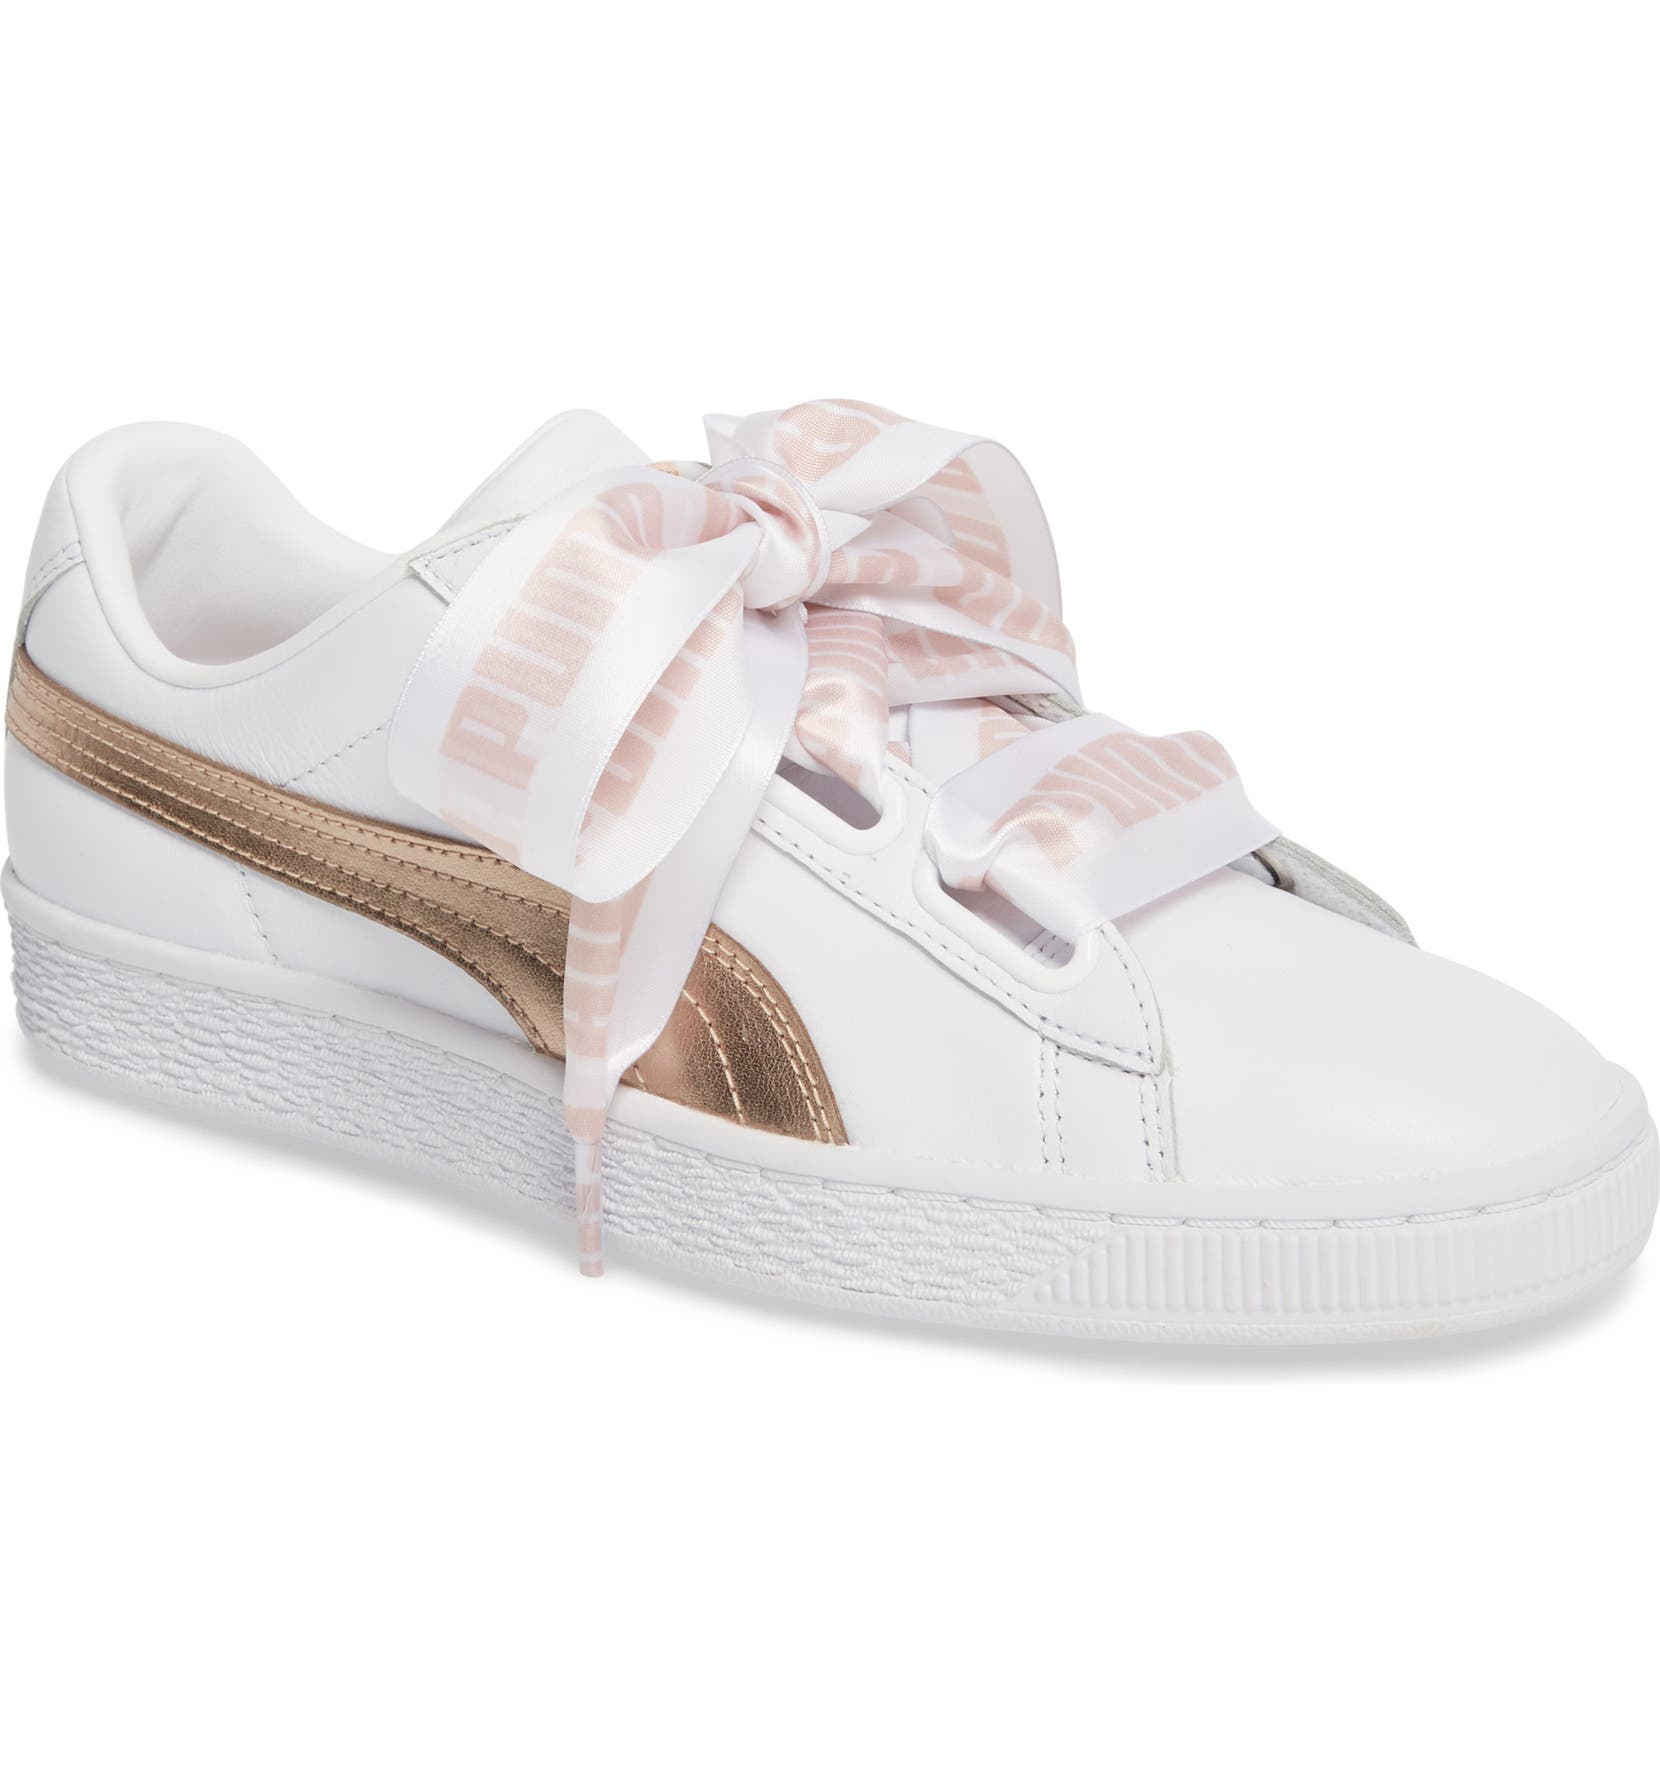 Puma Basket Heart Sneaker   Nordstrom 4a6a9a8895f3